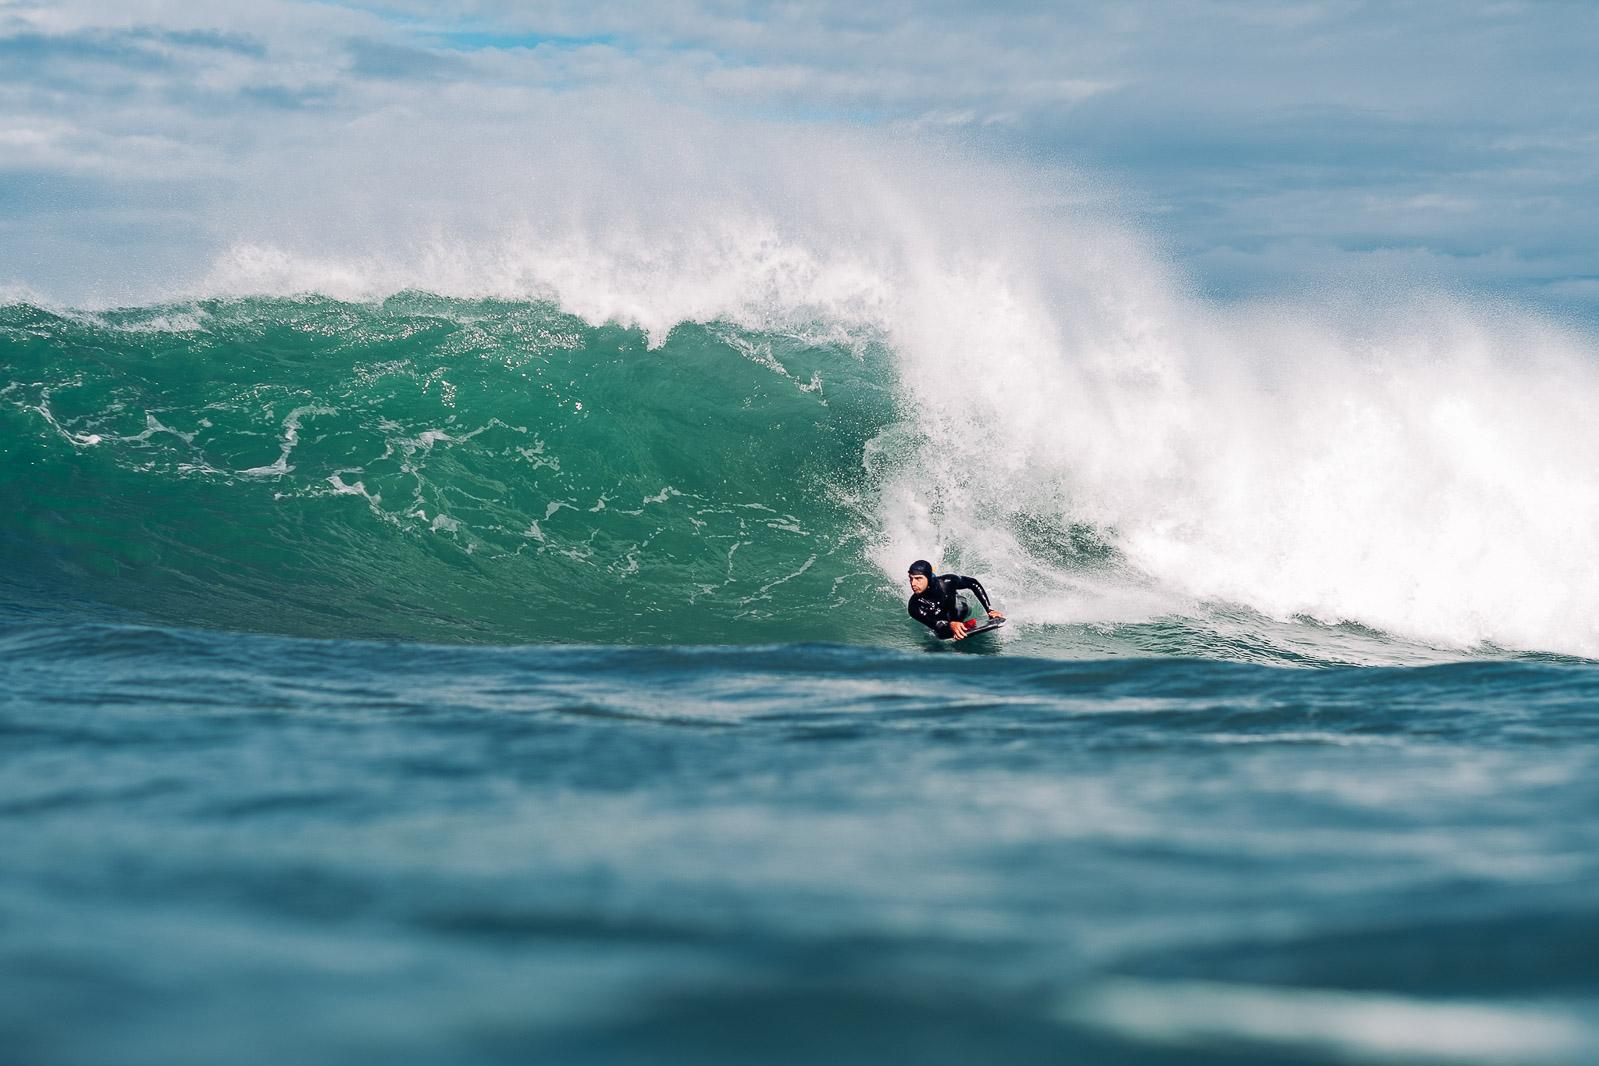 Photo de surf par Gregory Mignard